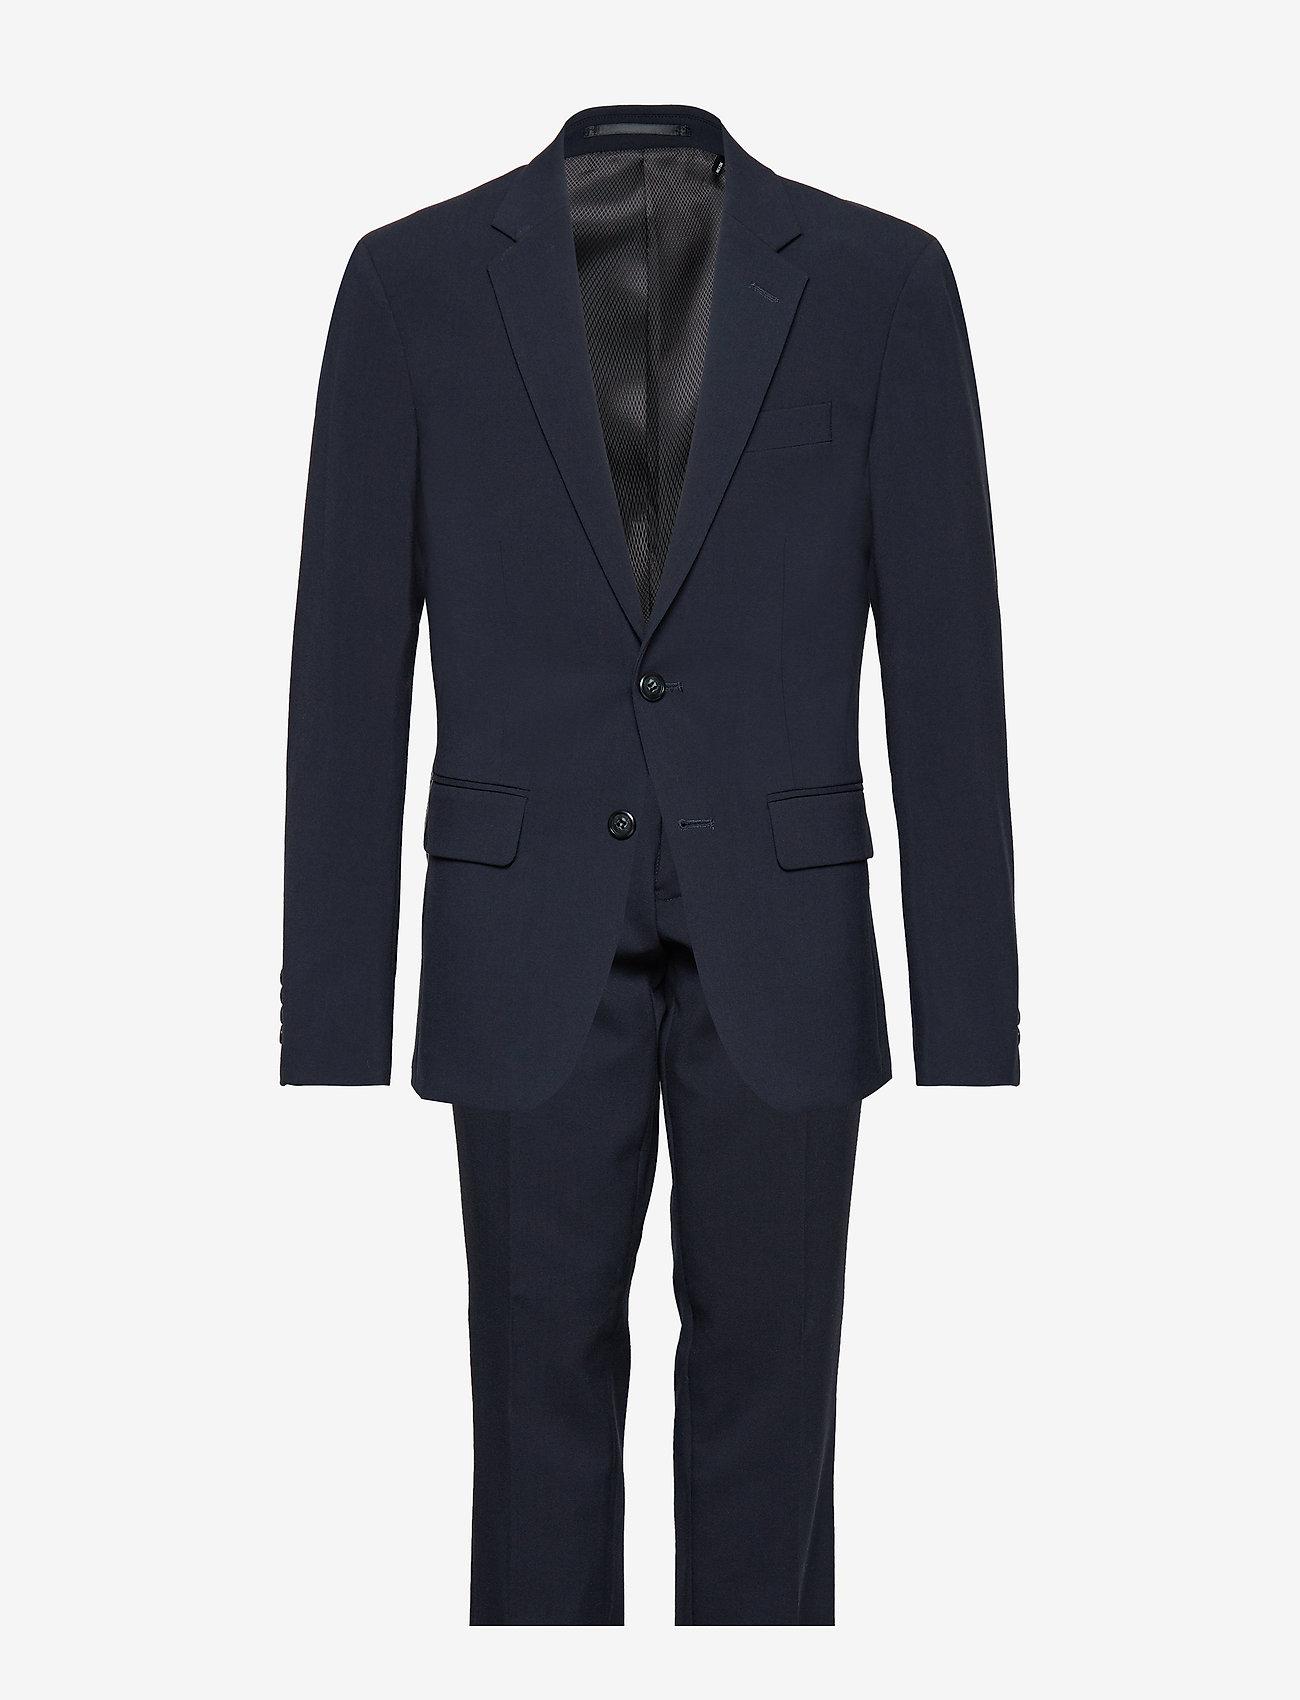 Lindbergh - Mens suit - kombinezony jednorzędowe - navy - 0